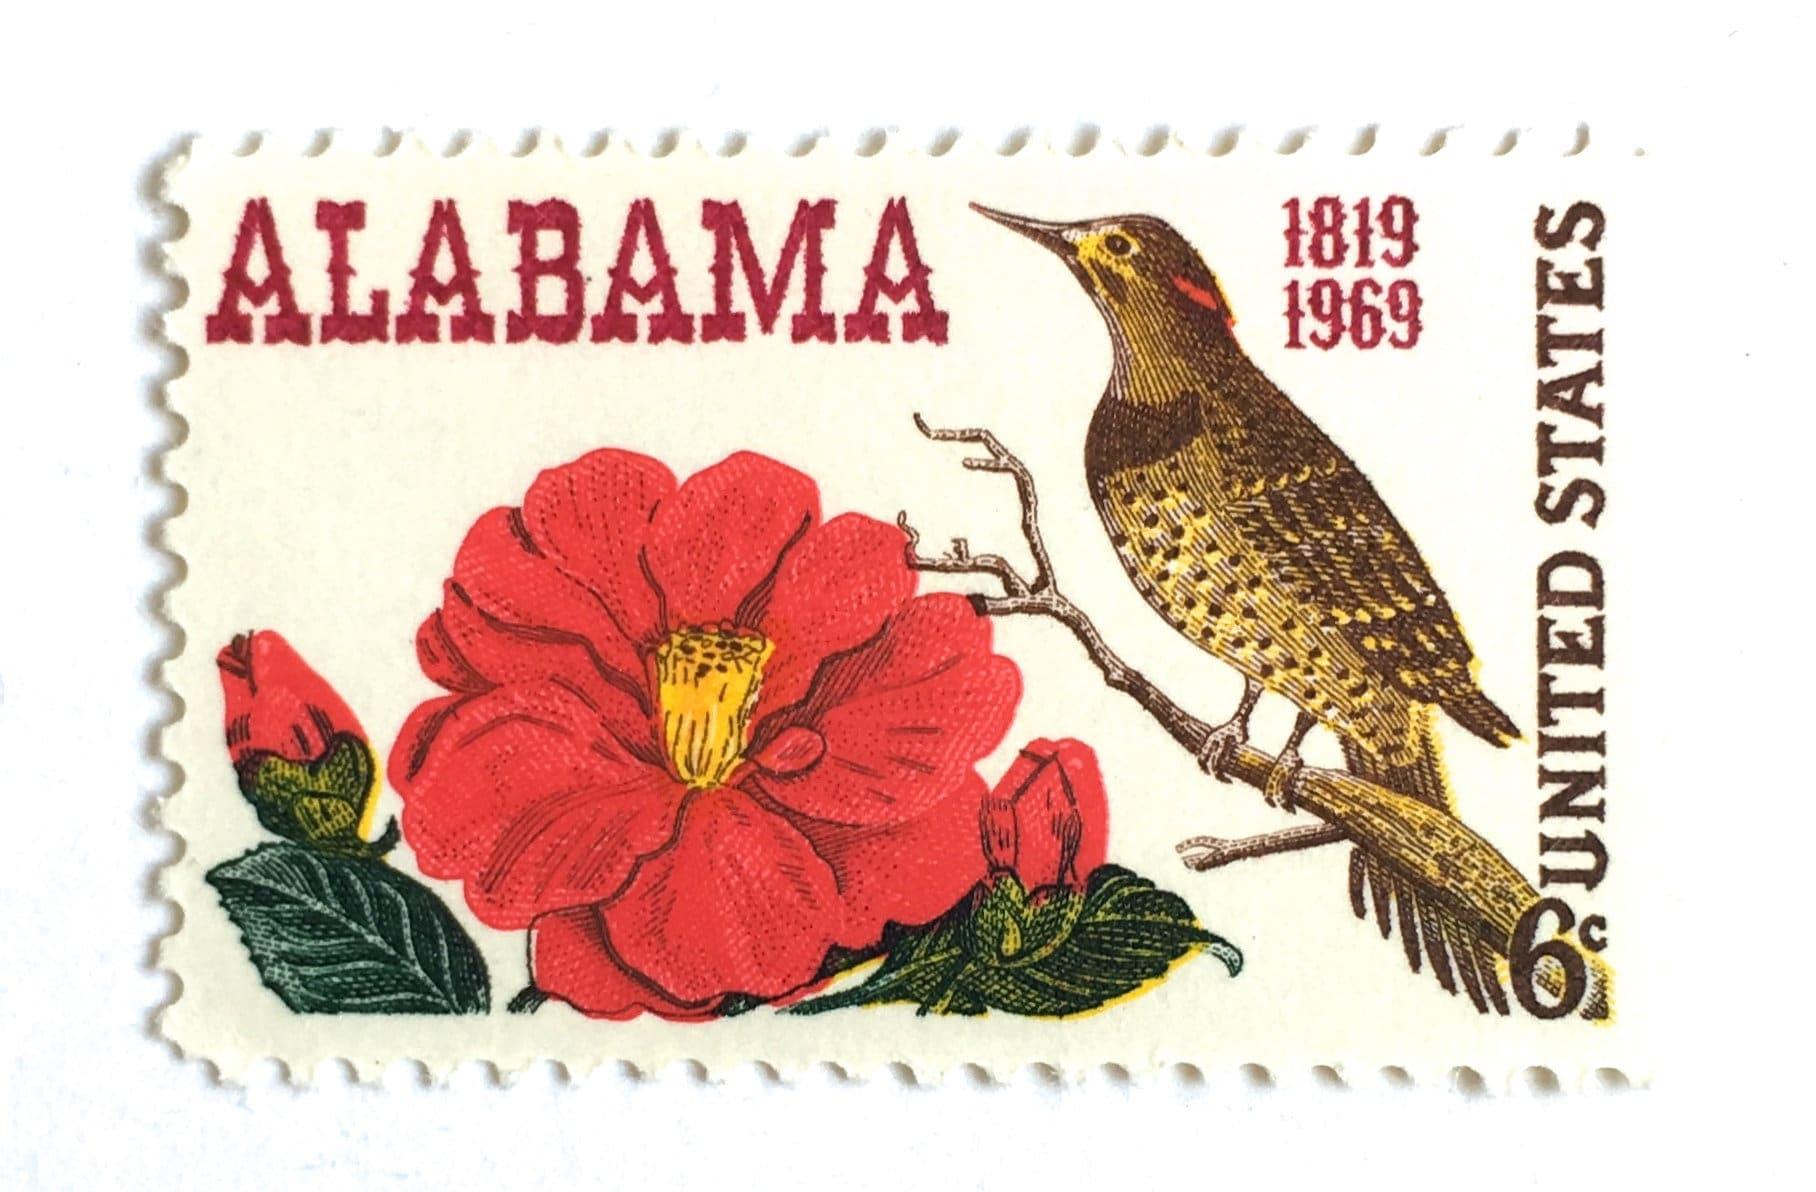 10 Unused Vintage Camellia Postage Stamps // 1969 Southern | Etsy